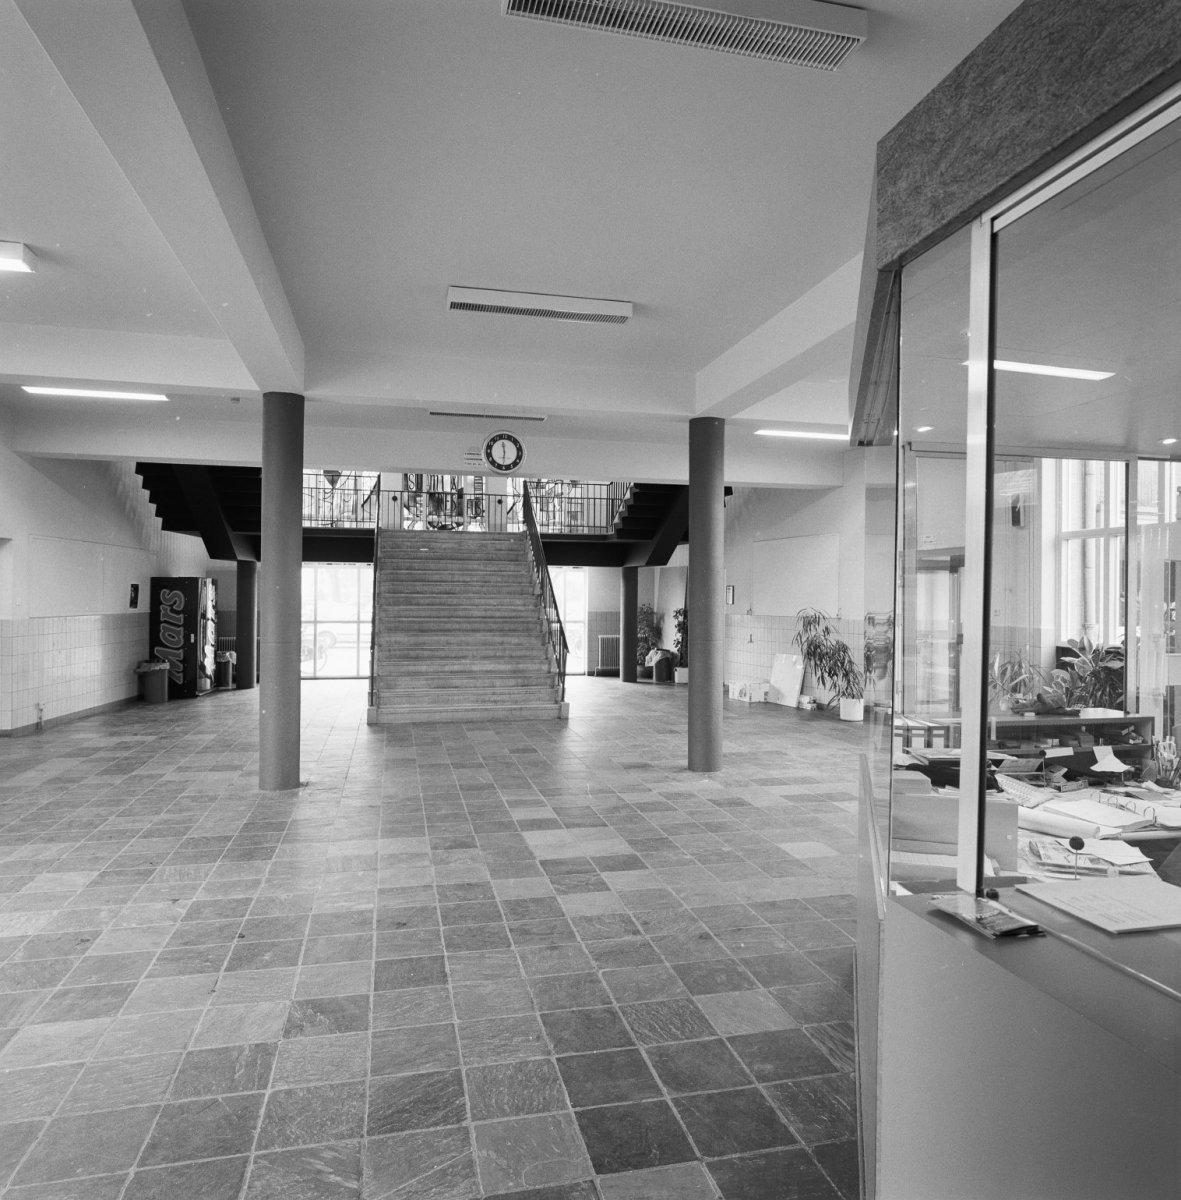 File interieur hal met trappenhuis eindhoven 20338238 for Interieur eindhoven